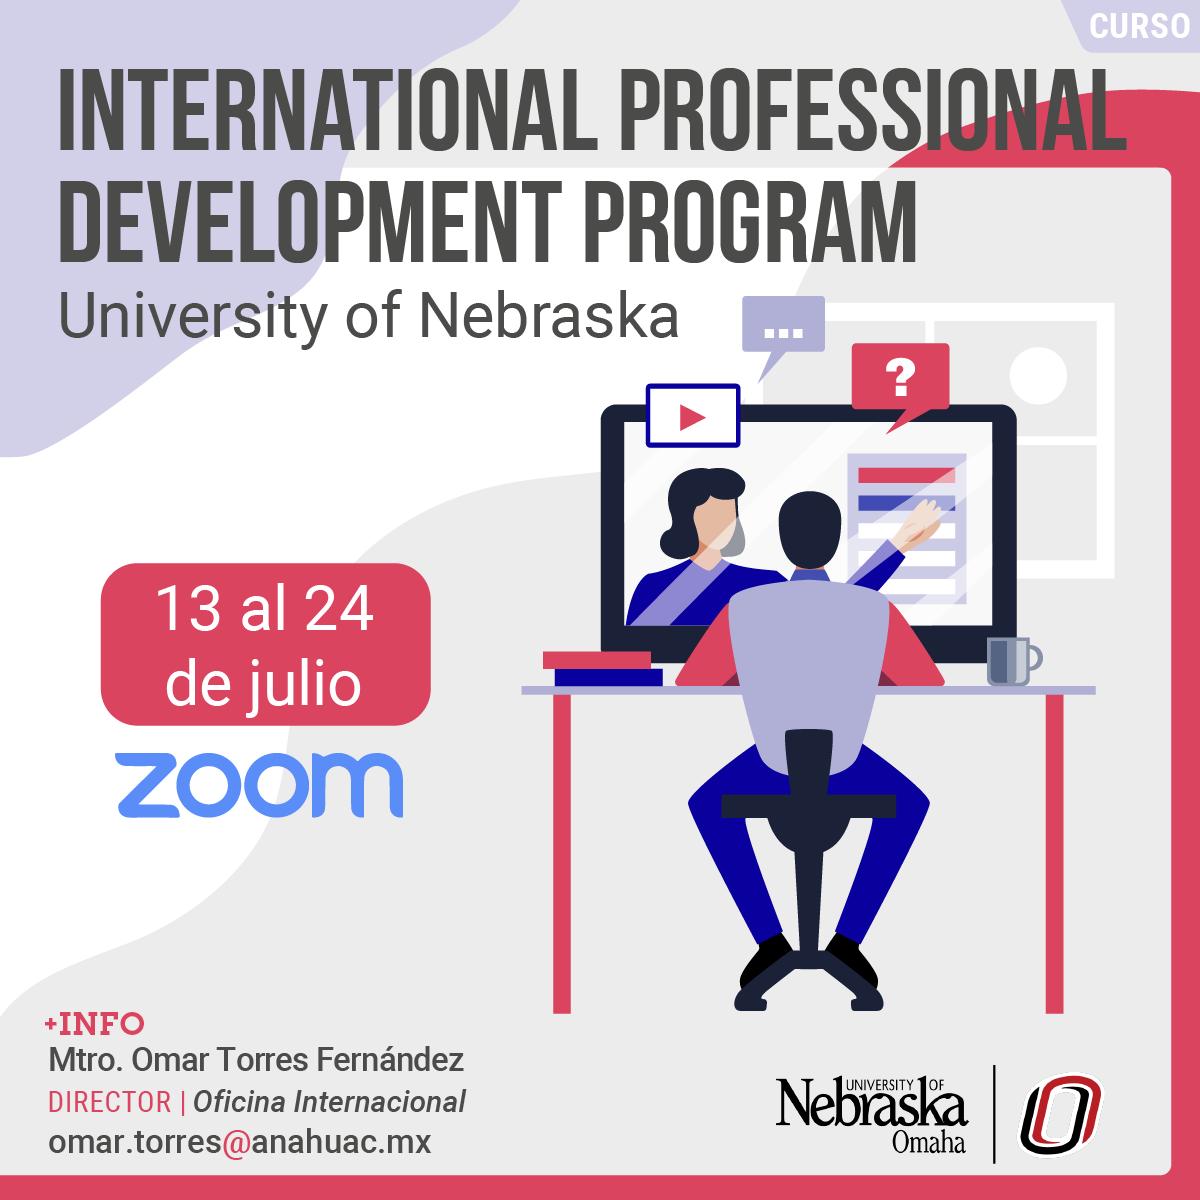 International Professional Development Program